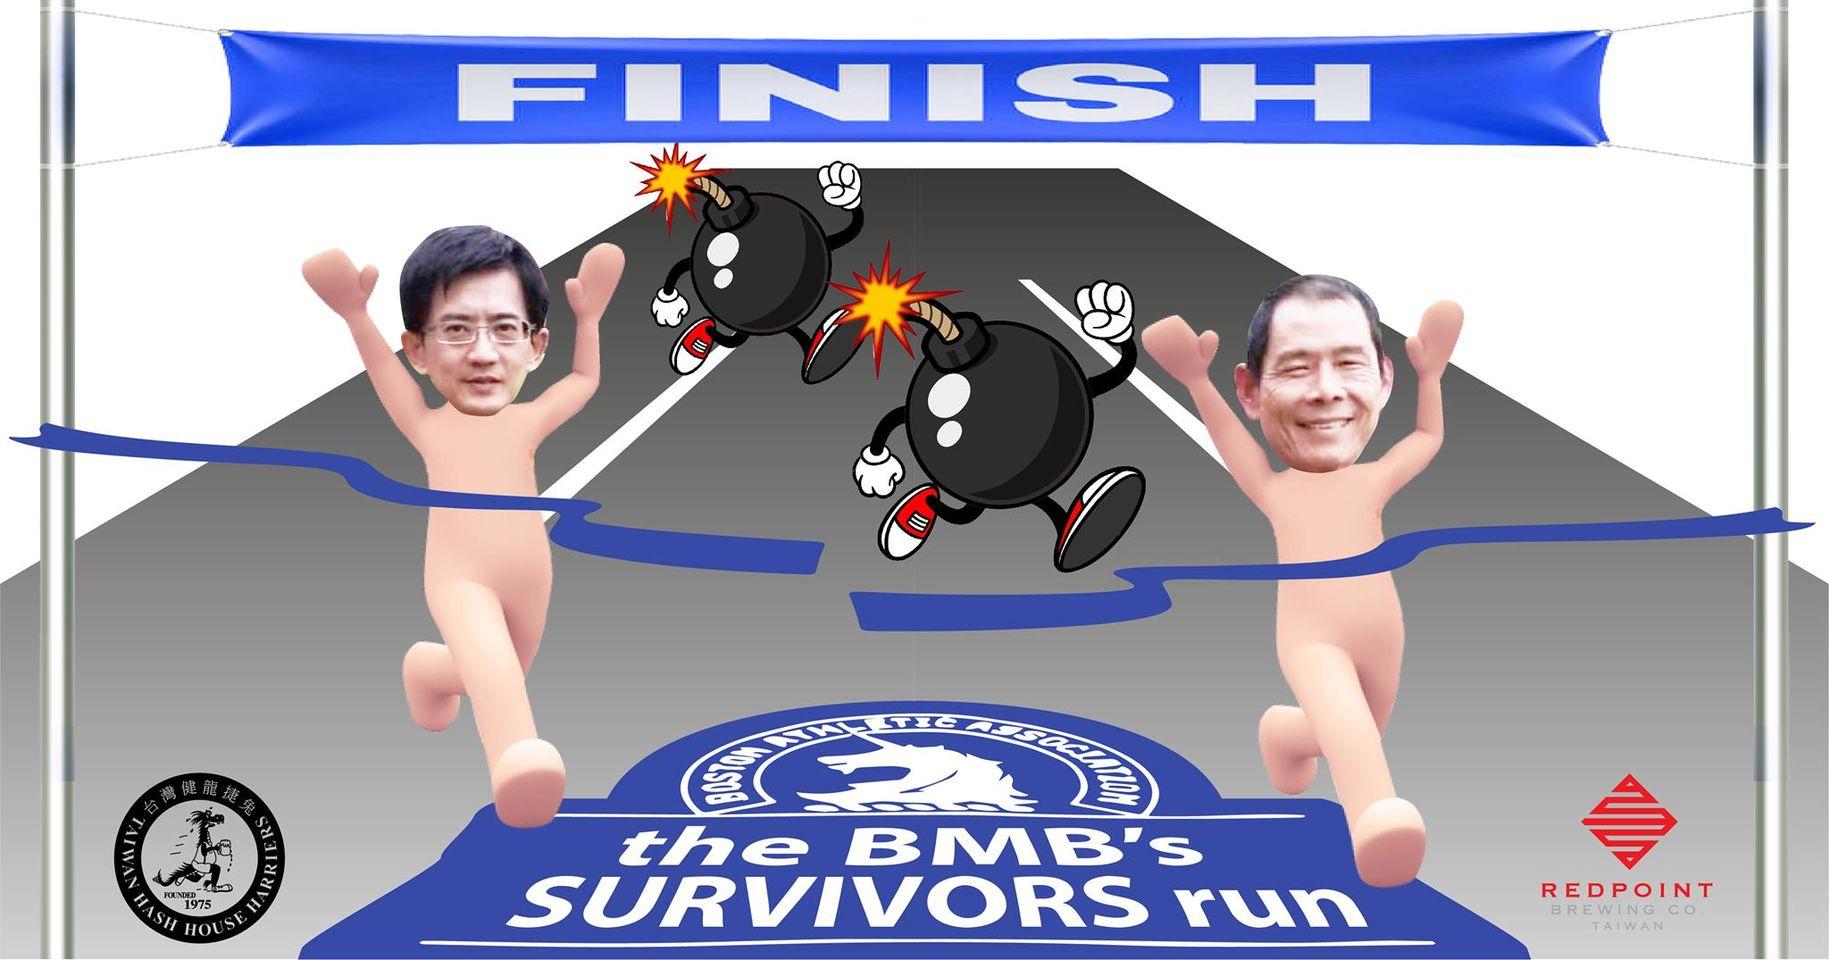 The BMB's Survivors Run # 2420